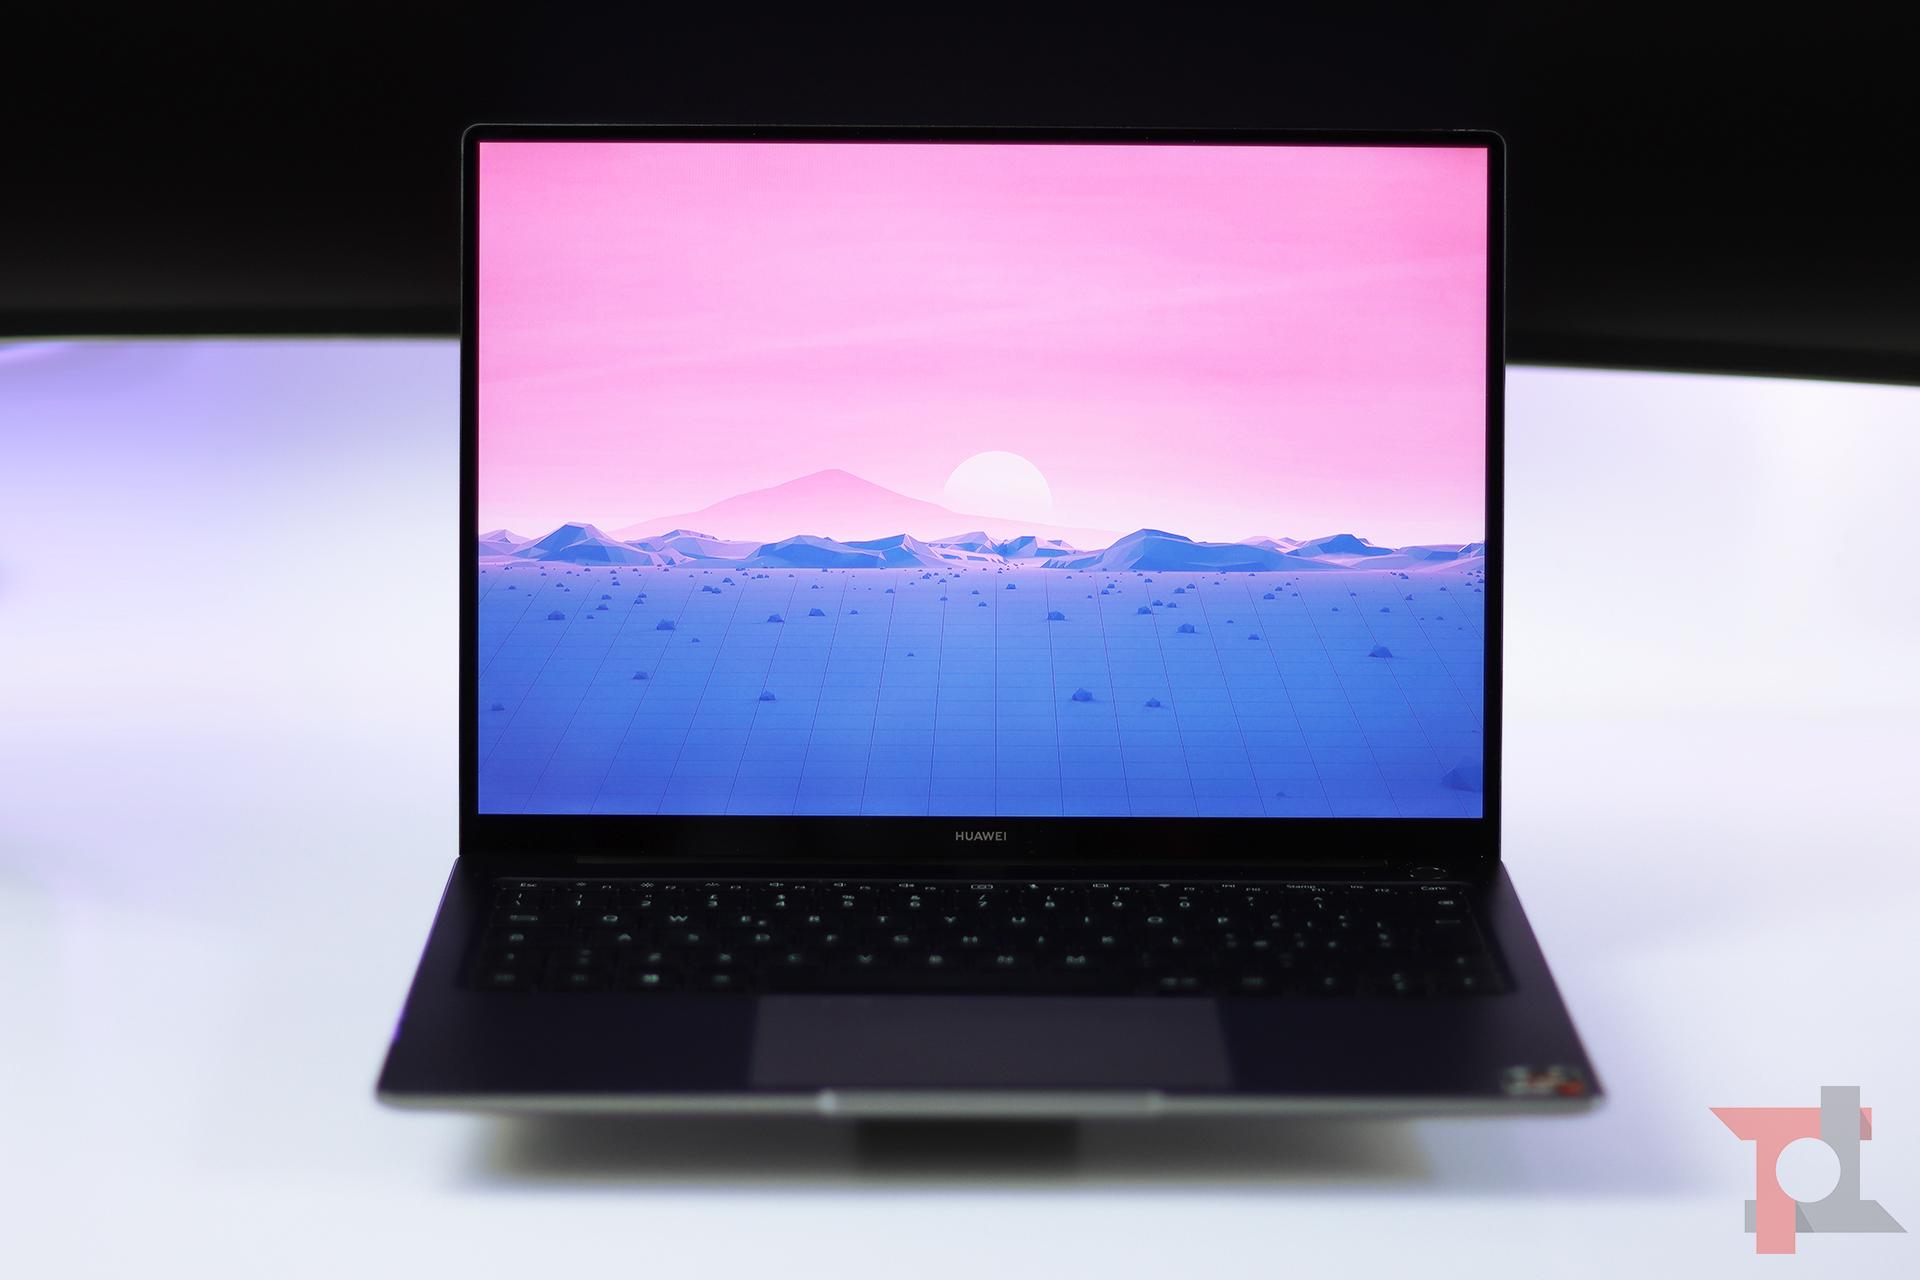 Huawei Matebook 14 AMD display